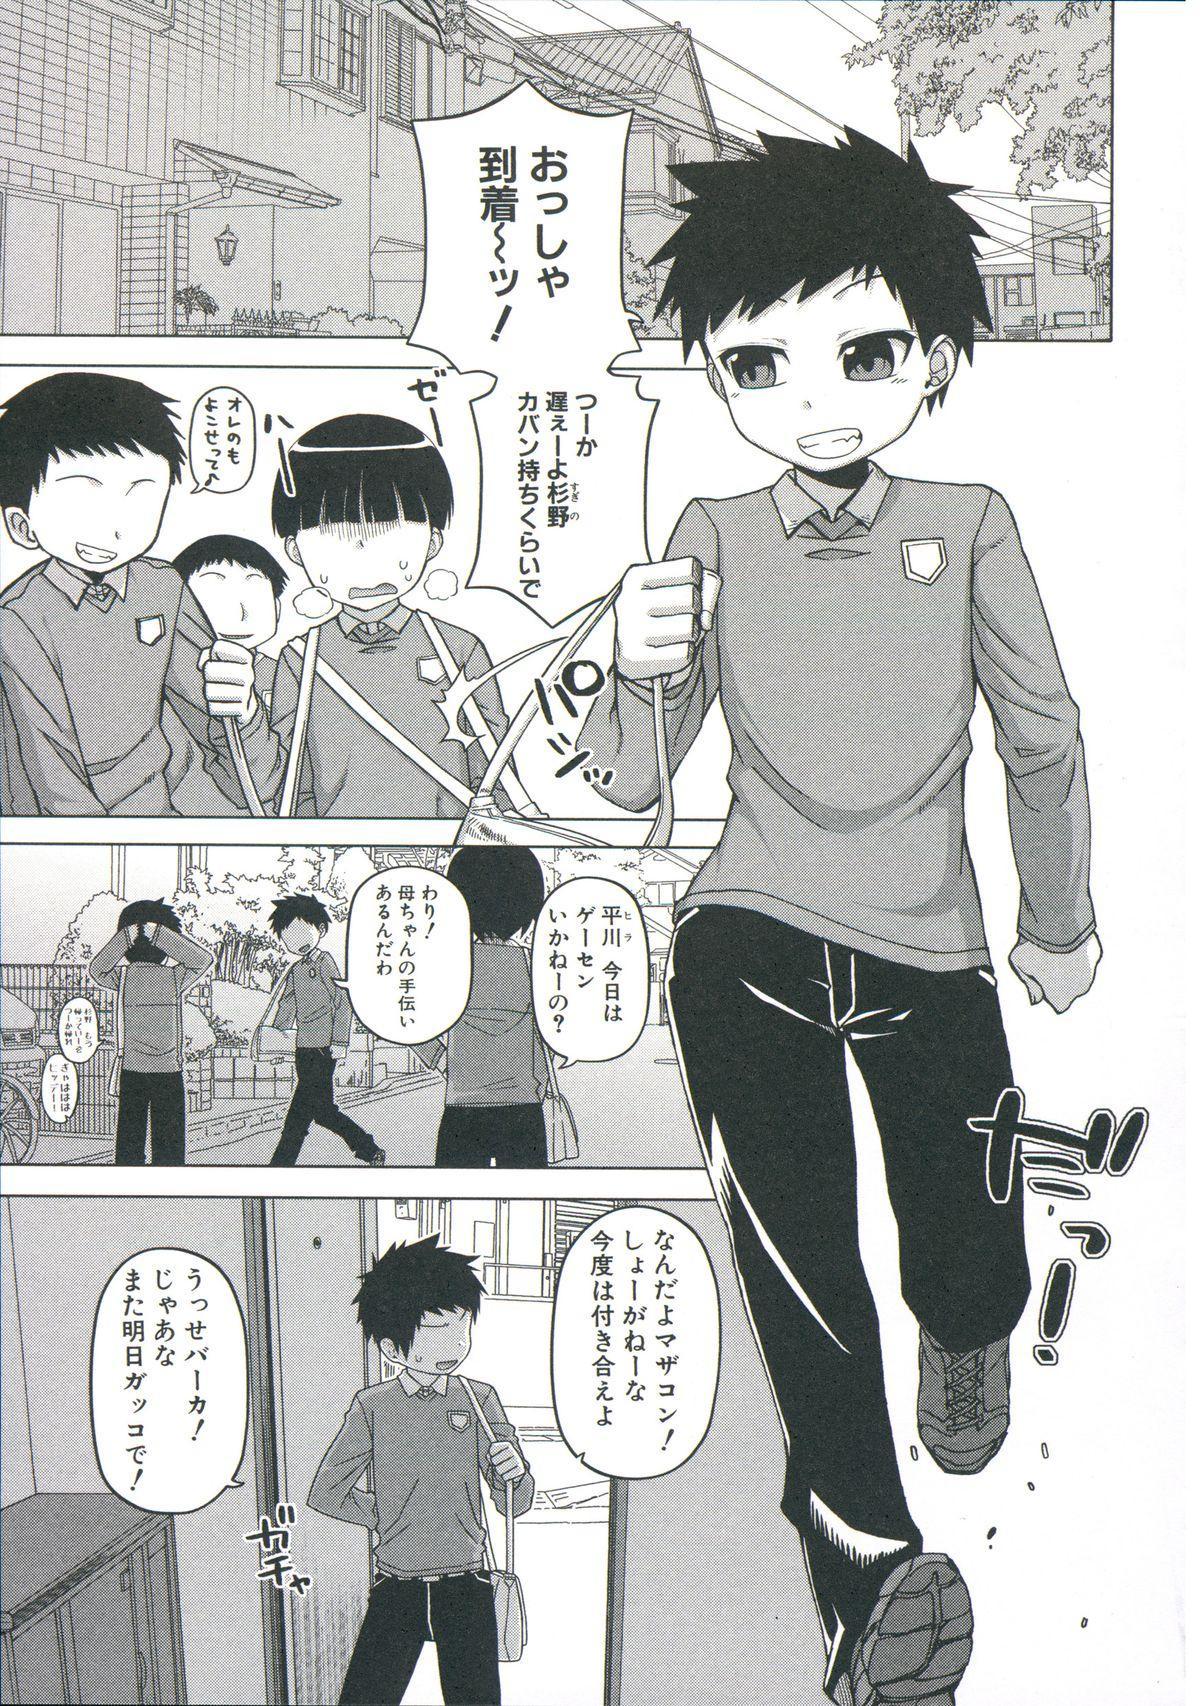 [Takatsu] Ou-sama Appli - King App 71